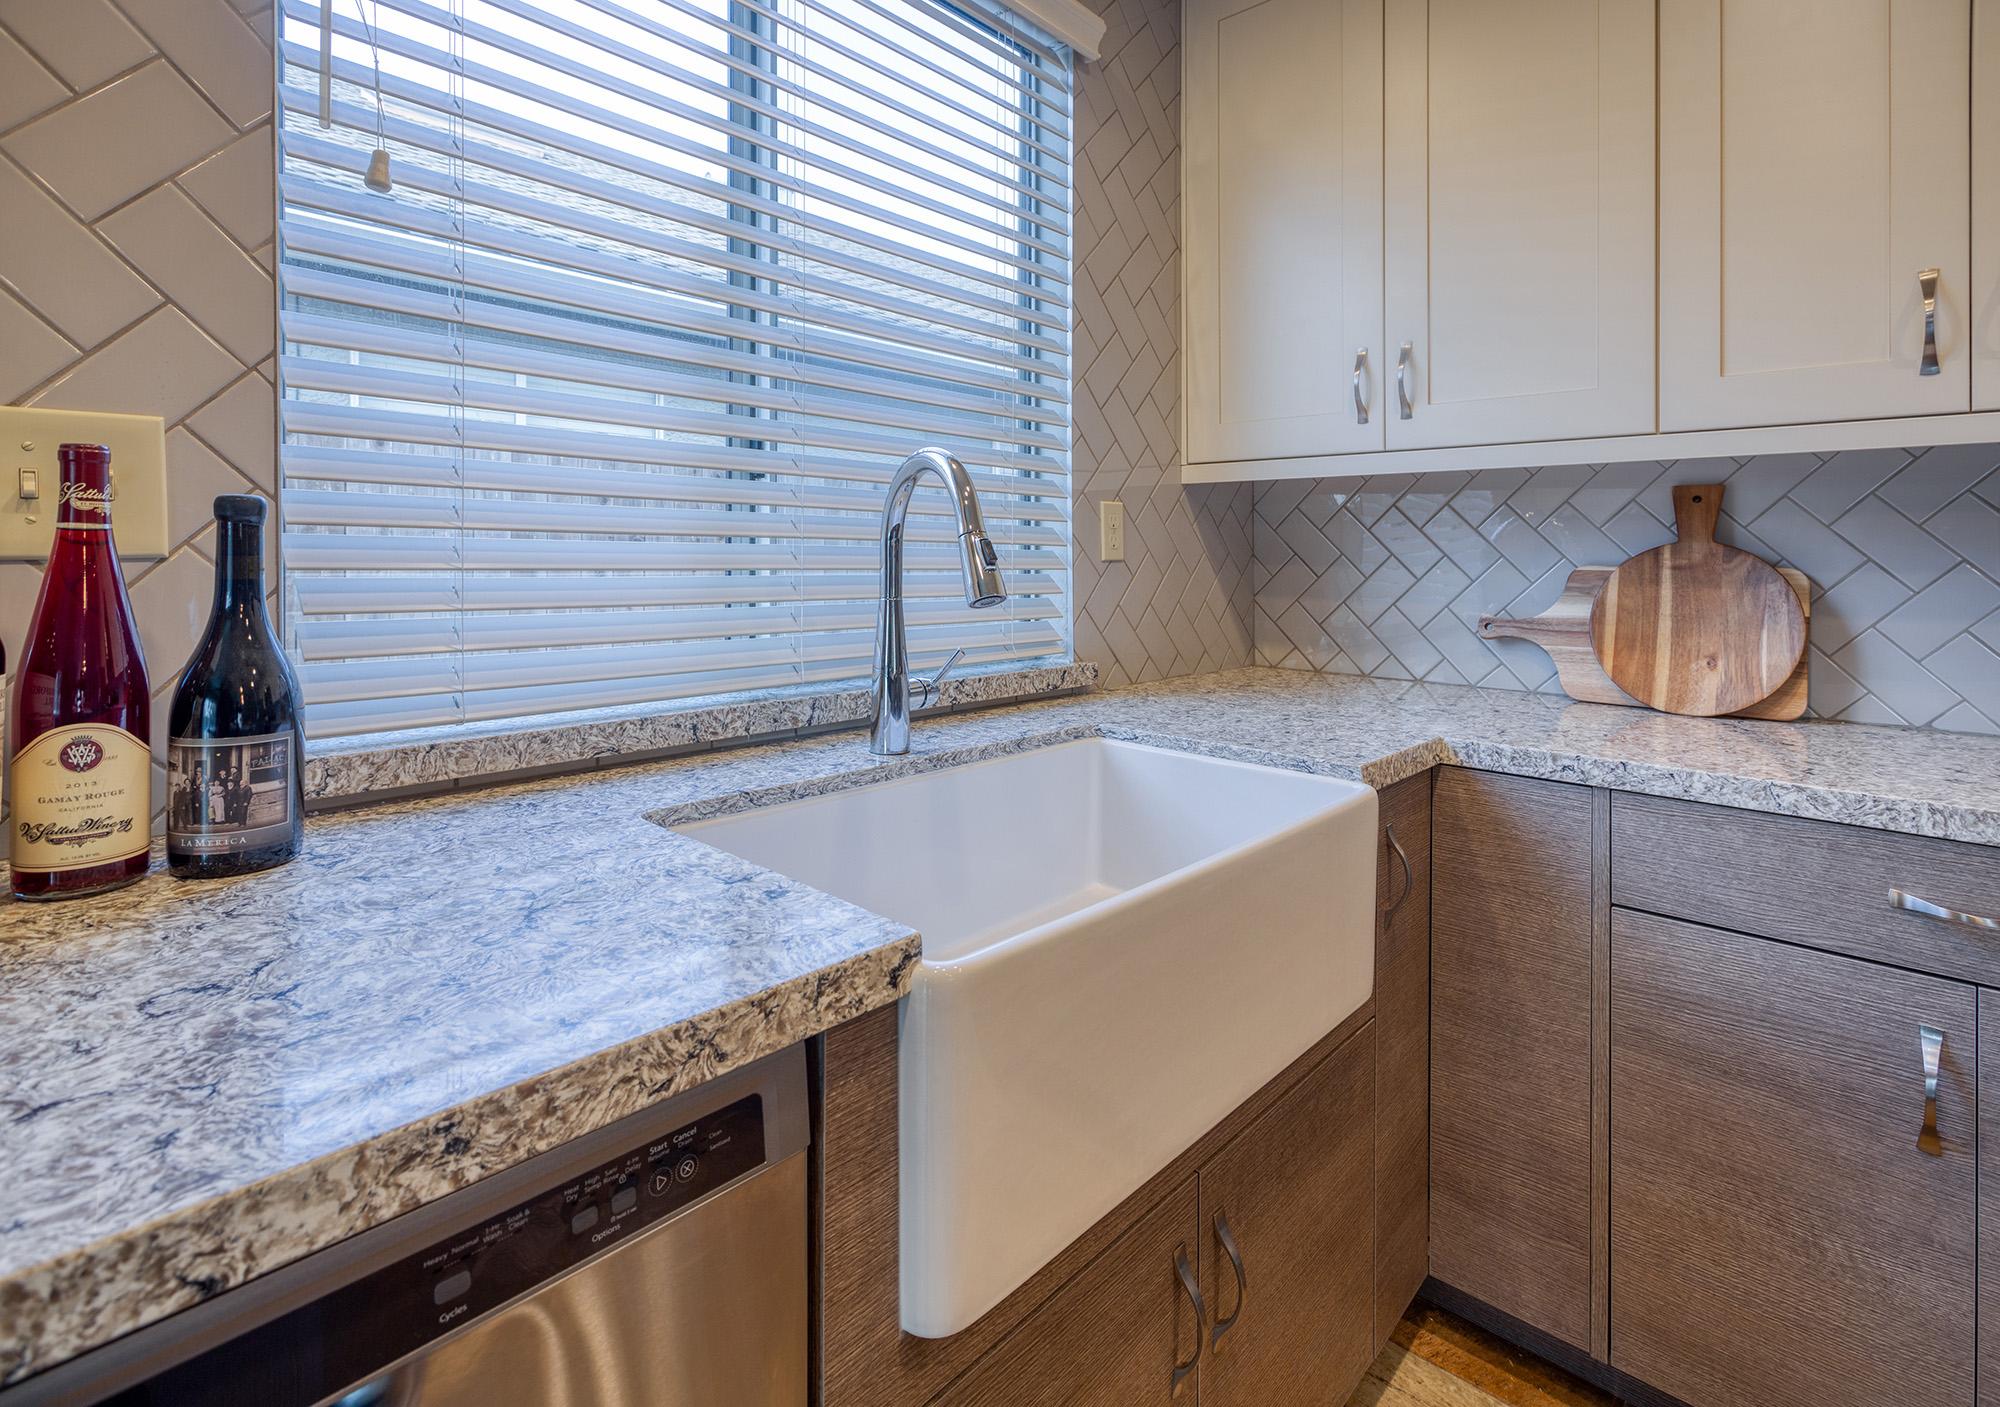 kitchen-remodel-apron-sink-tracy-california-ktj-design-co-interior-design.jpg